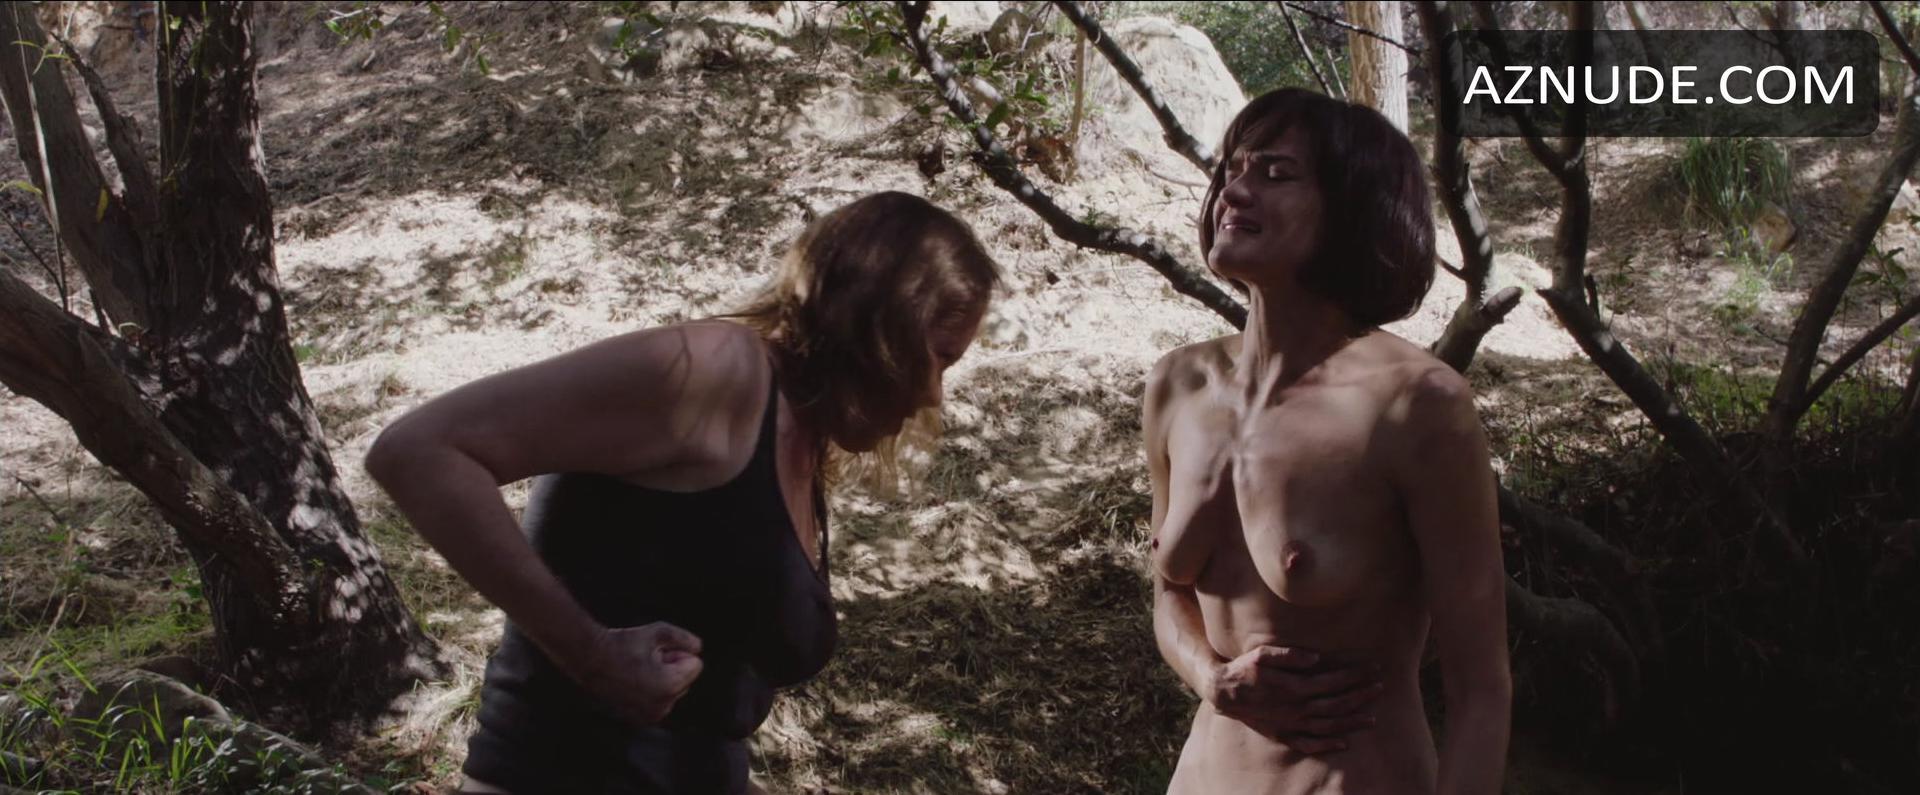 Nackt  Jamie Bernadette ❤️ Berühmtheit